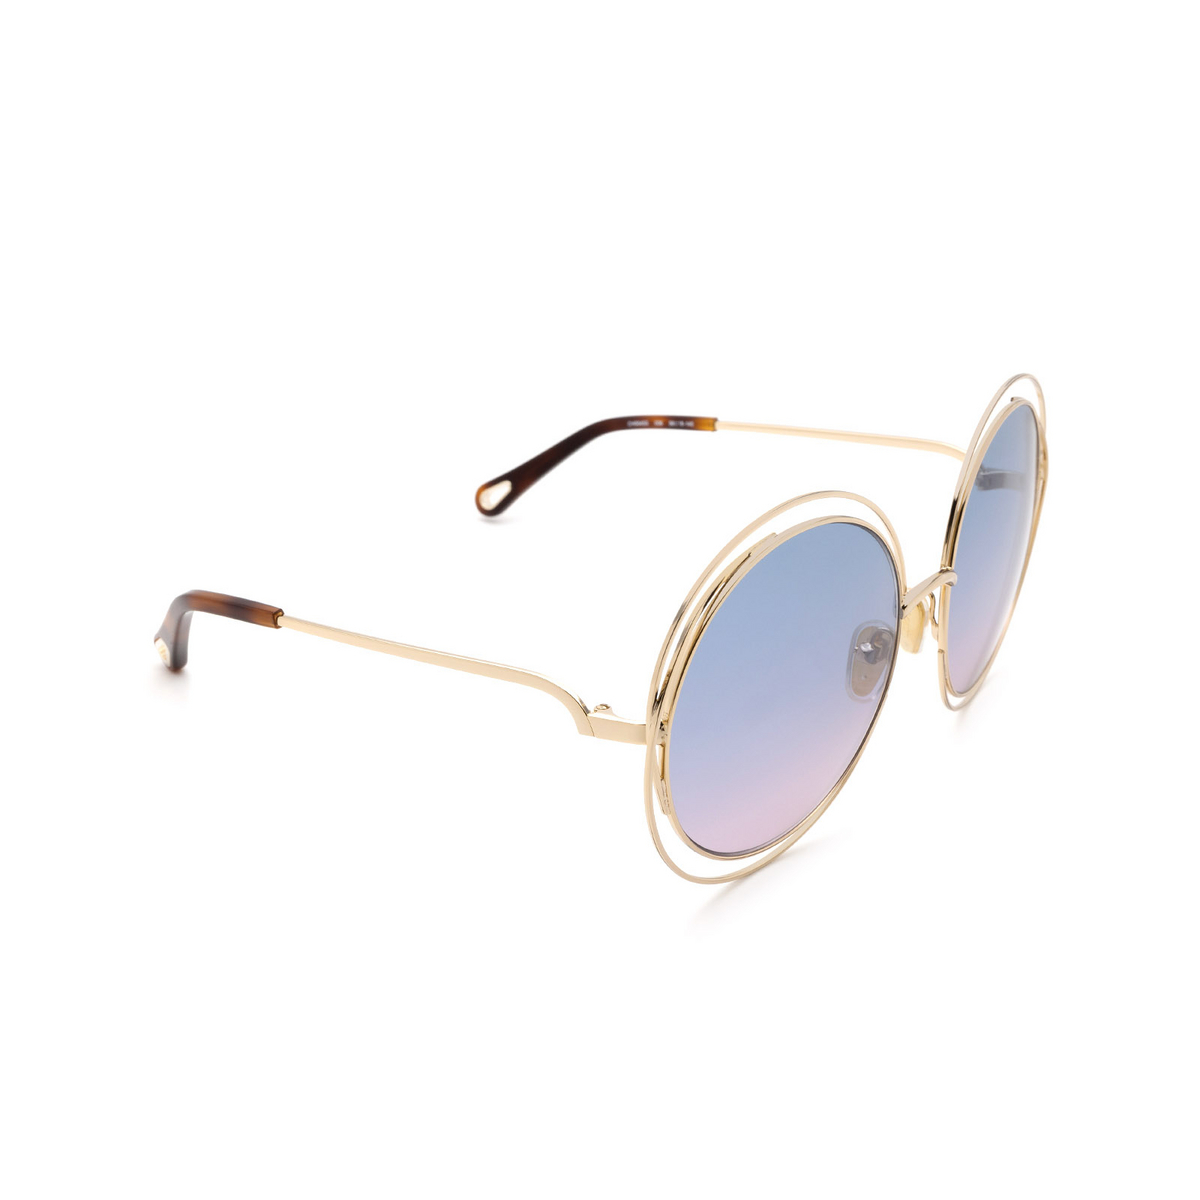 Chloé® Round Sunglasses: CH0045S color Gold 006 - three-quarters view.